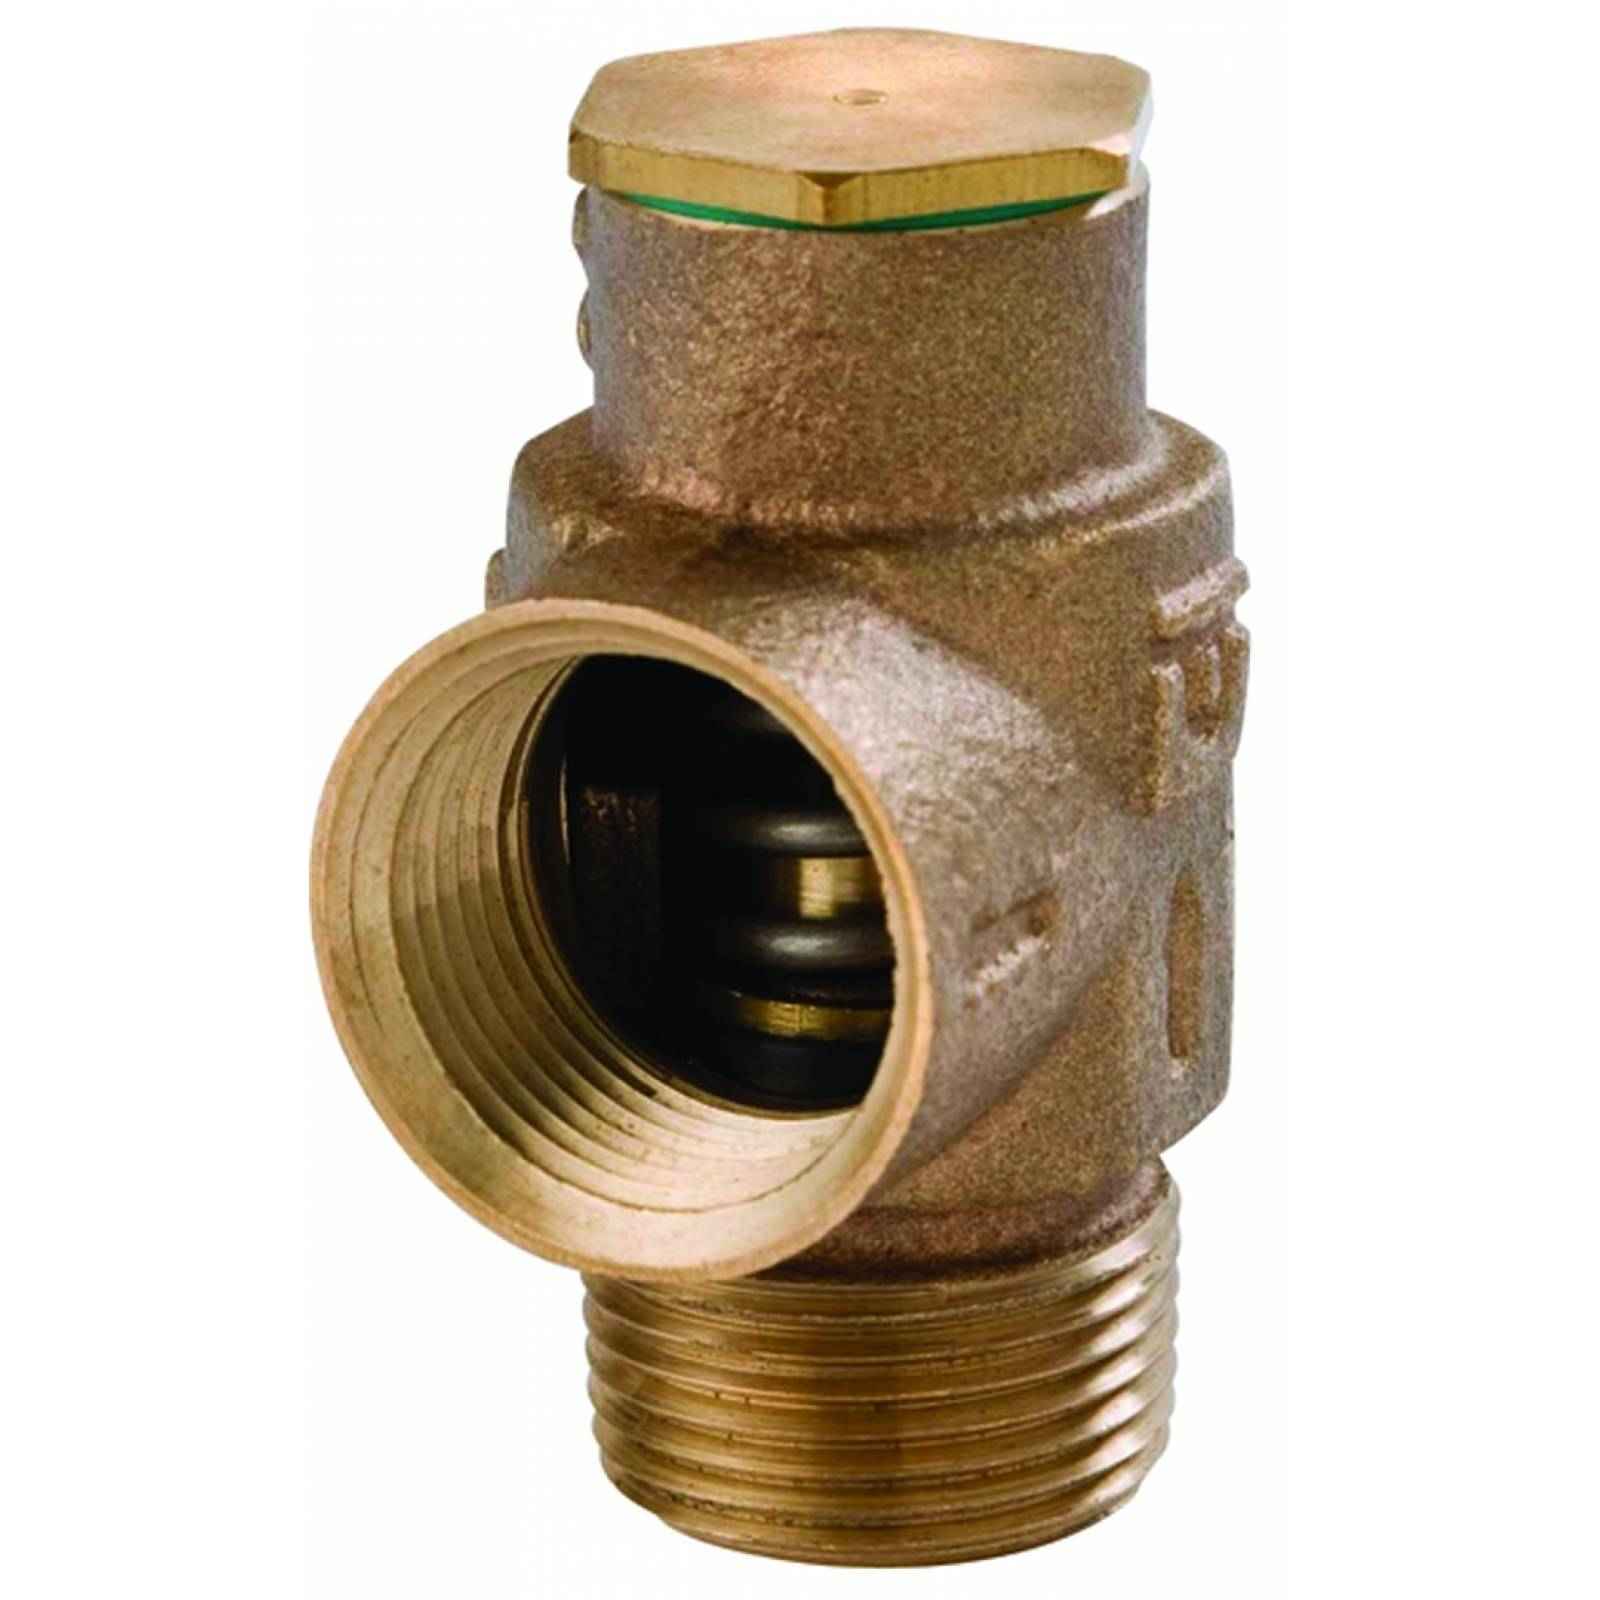 Válvula de alivio para calentador VAR01.13 URREA